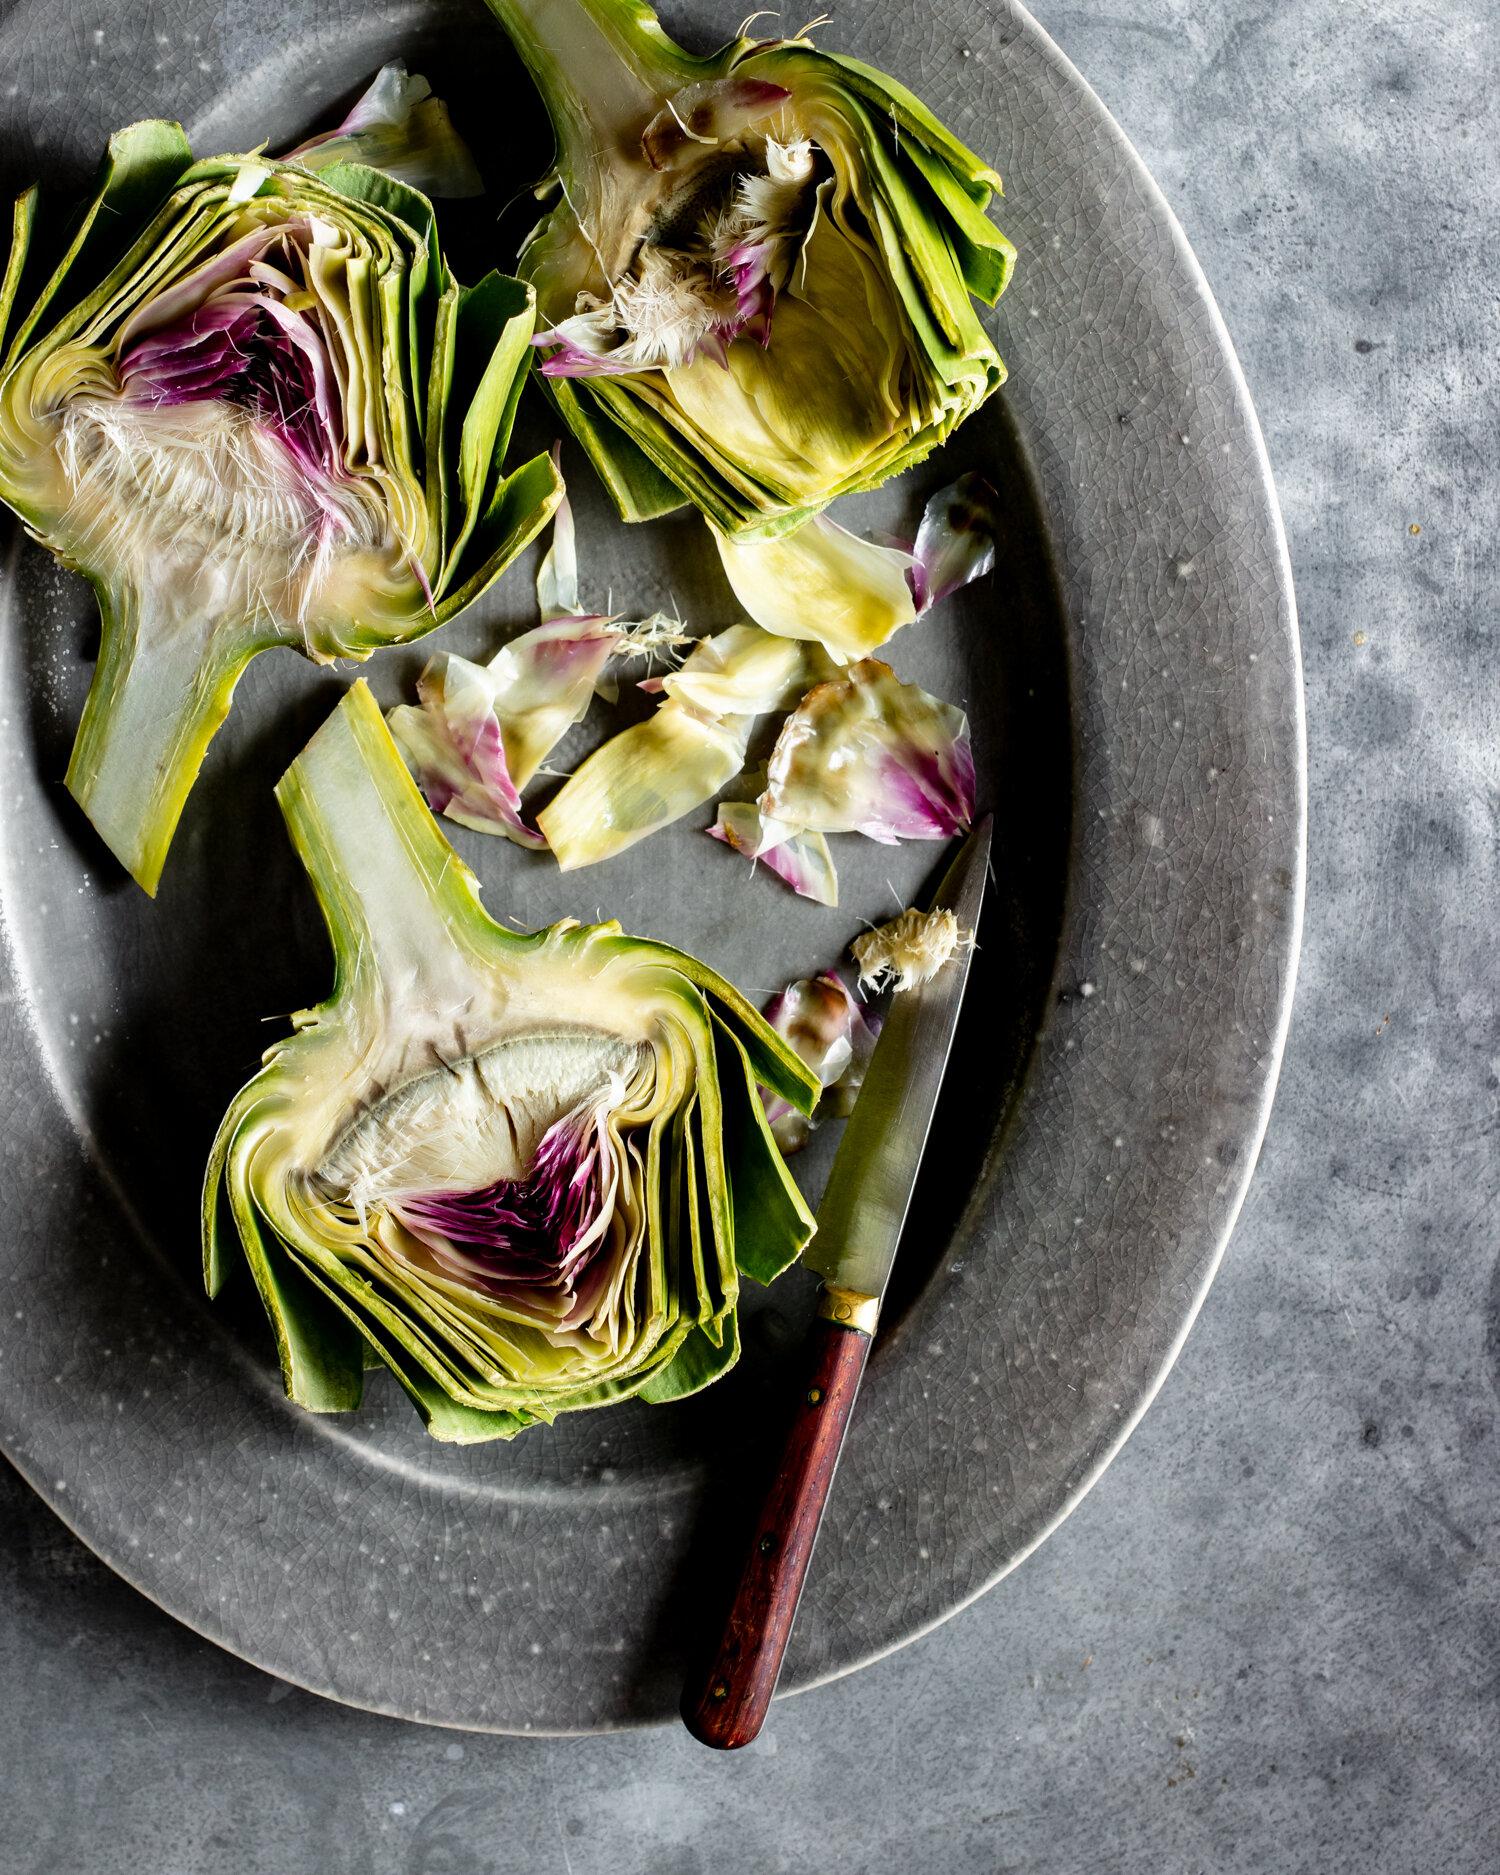 erin-scott_san-francisco-california-food-photographer-natural-light-editorial-raw-artichokes.jpg